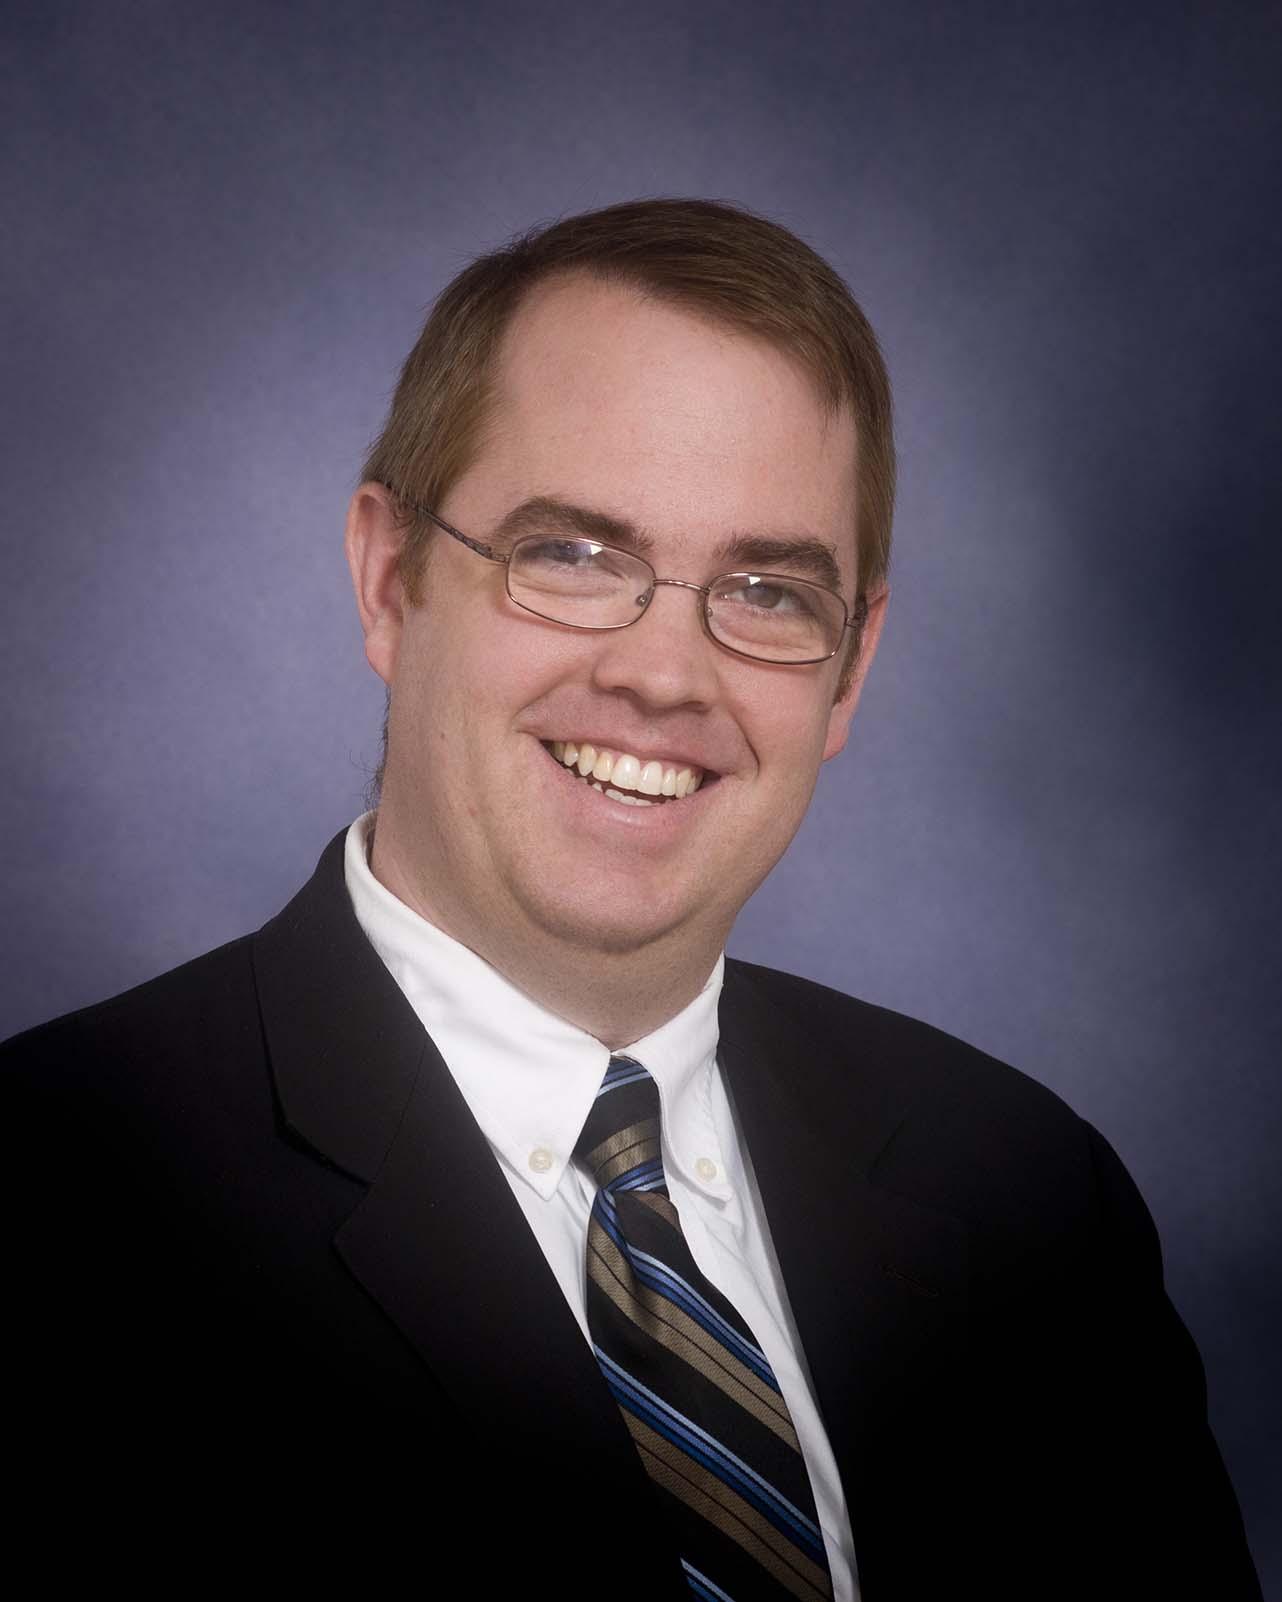 Todd Sivia, Managing Partner of Sivia Law